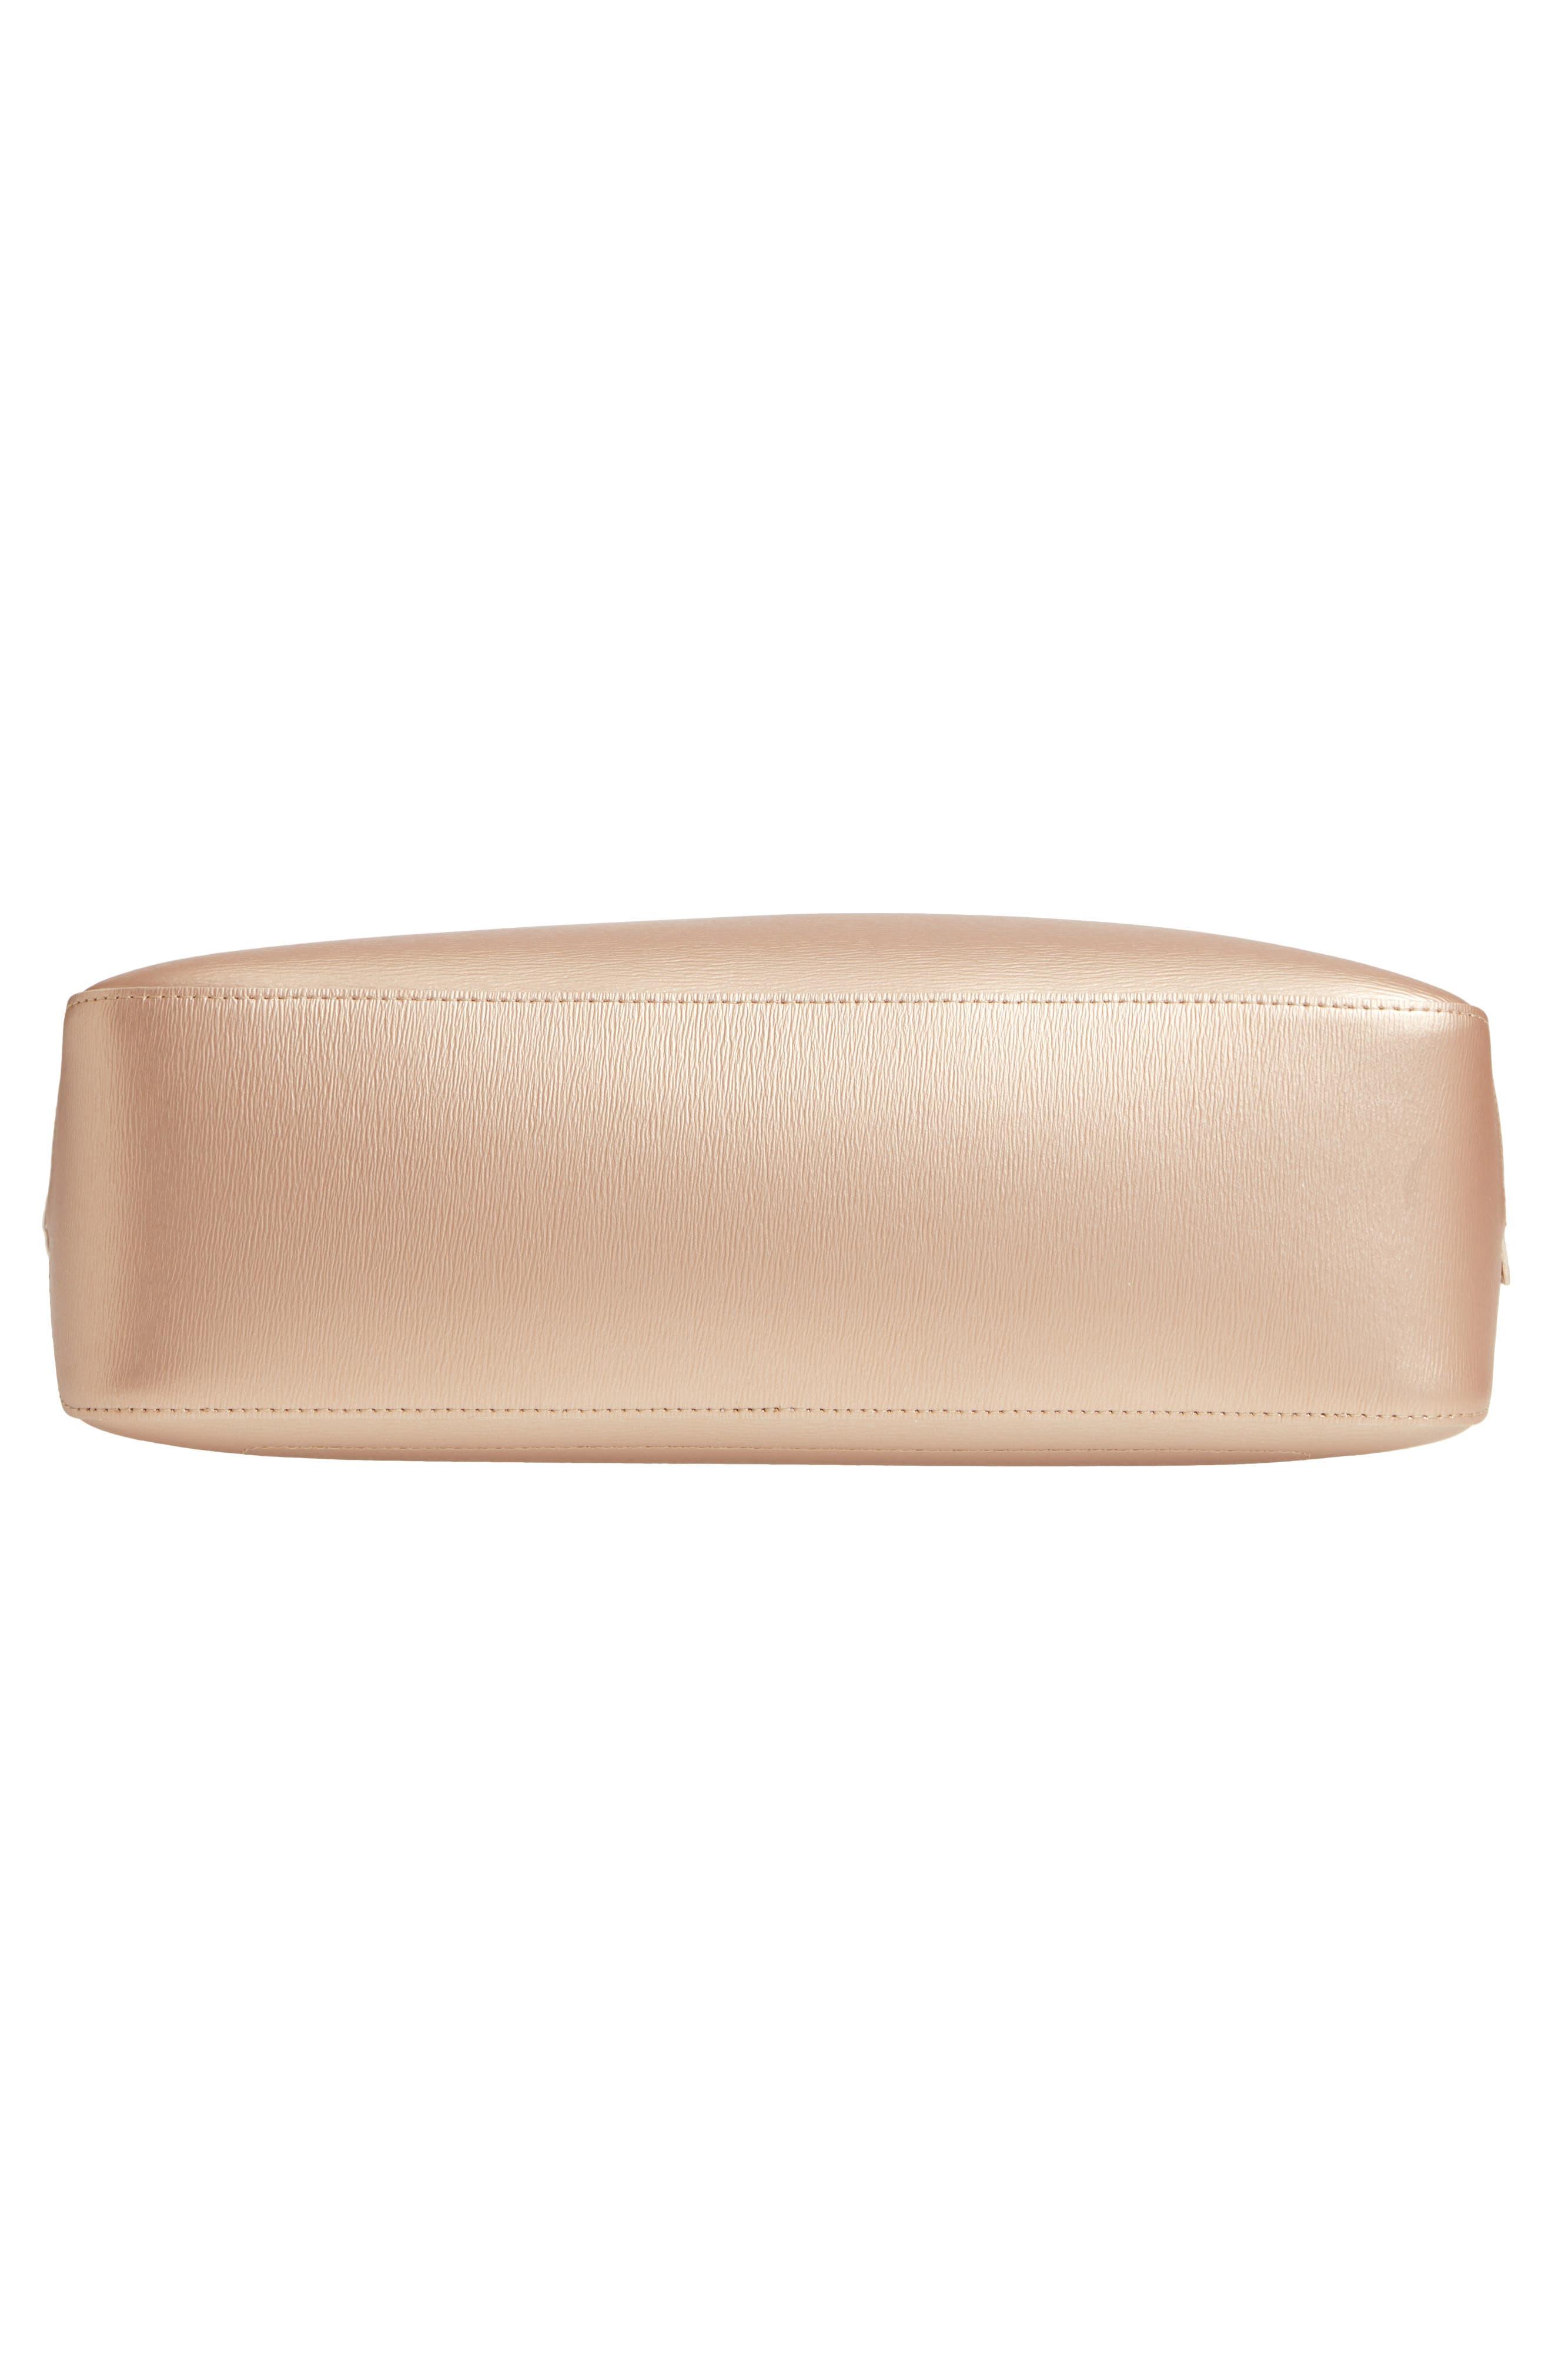 Roseau Metallic Leather Shoulder Tote,                             Alternate thumbnail 6, color,                             697